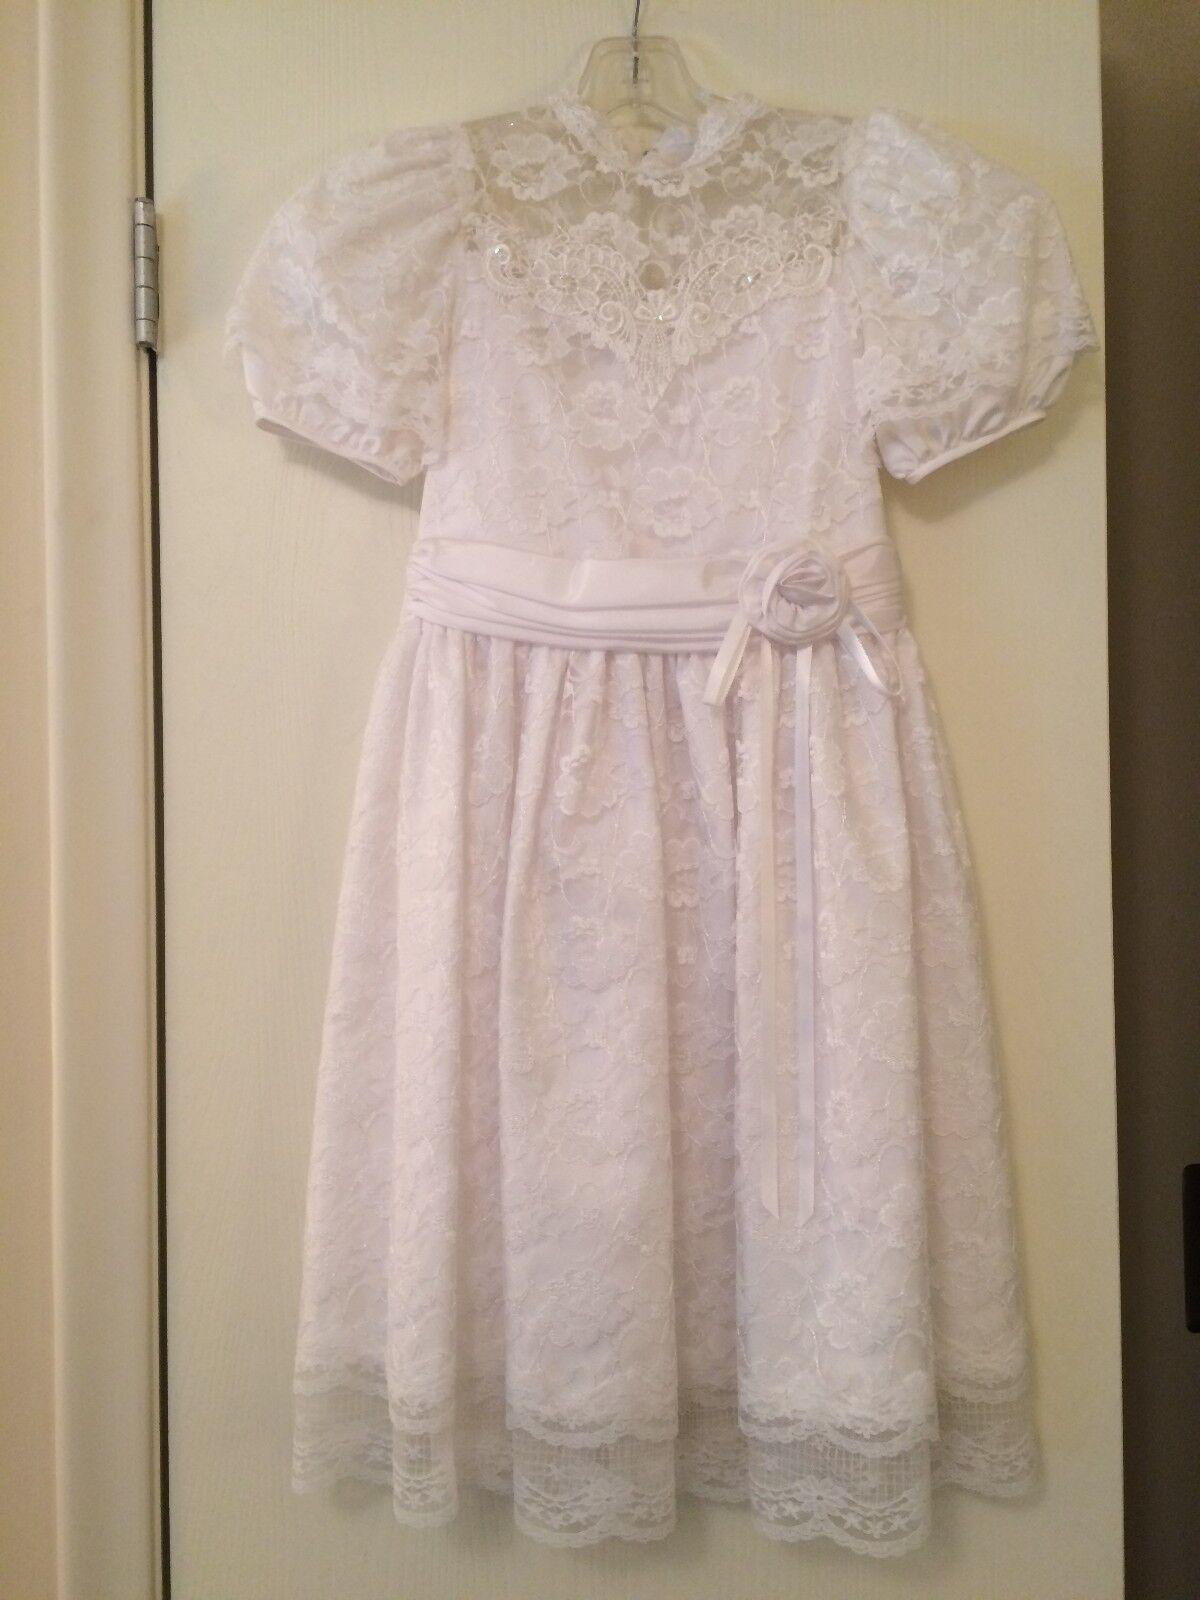 Dorissa International Nicole White Dress Girls 8 First Communion Wedding Formal